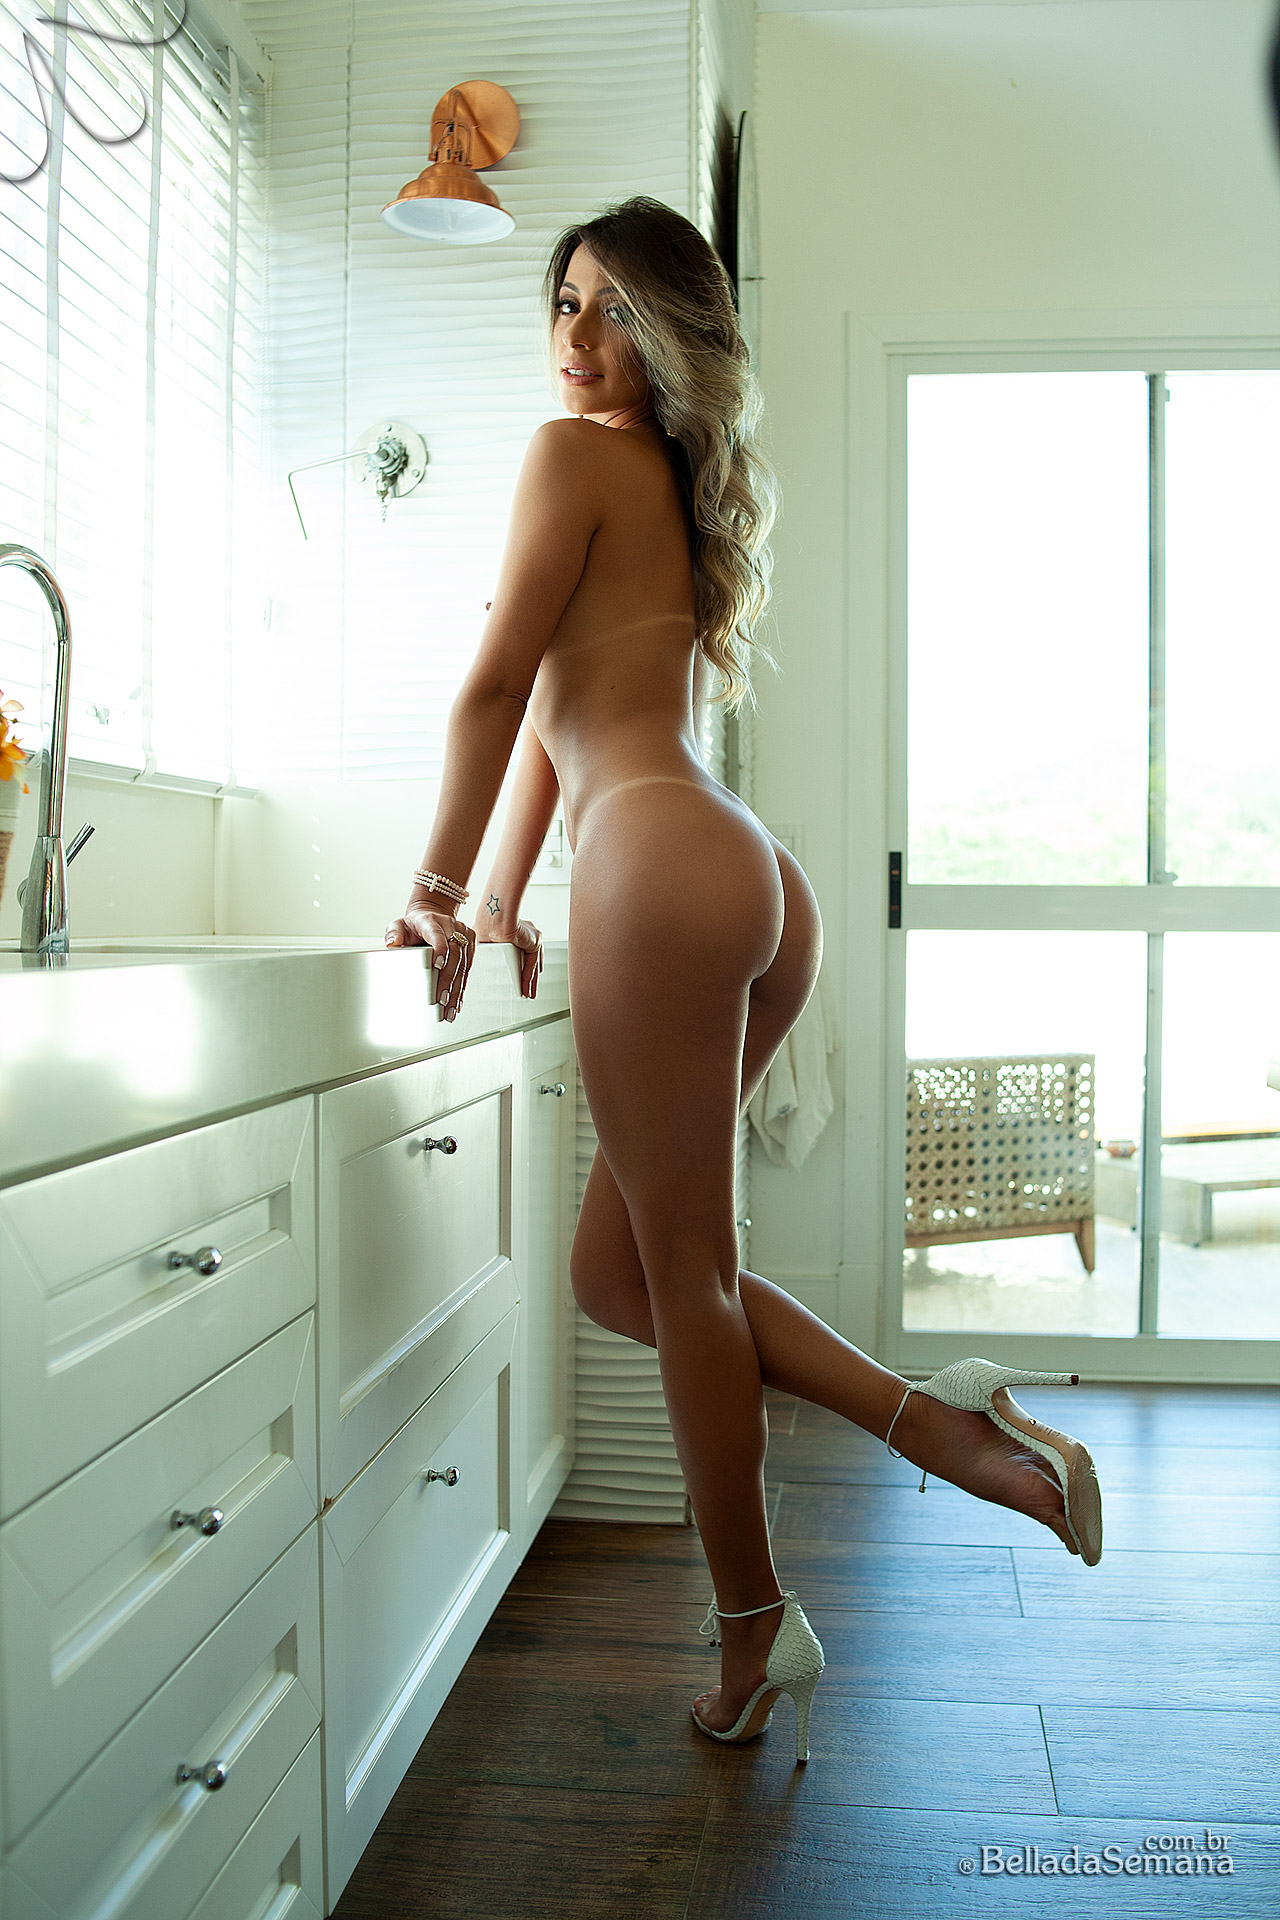 Bella da Semana | Luanna Lodi #2